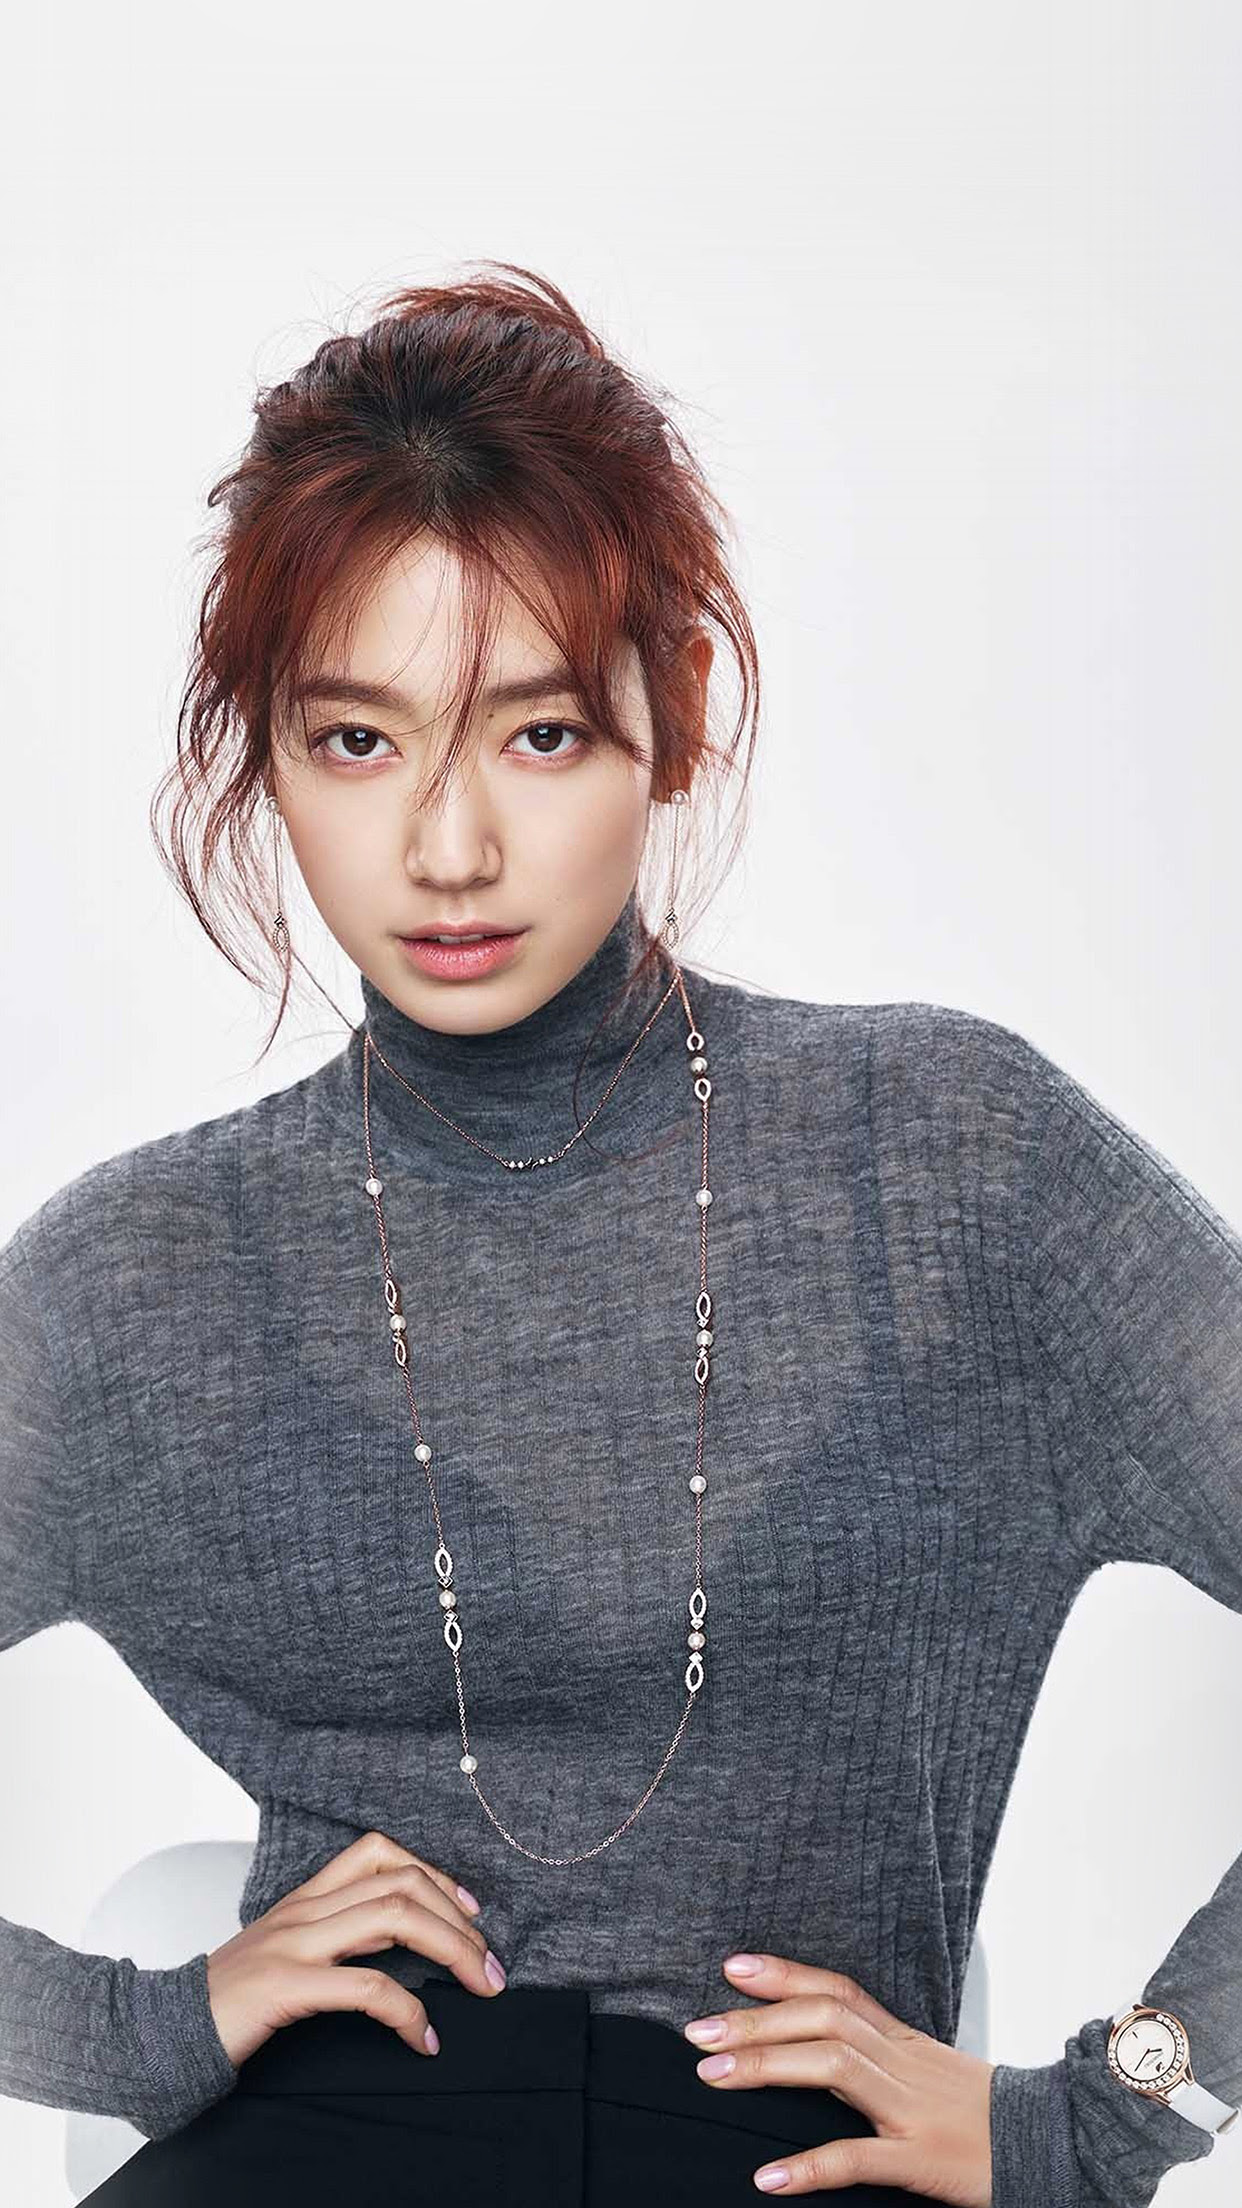 I Love Papers Hm69 Kpop Girl Pose Photoshoot Park Shinhye